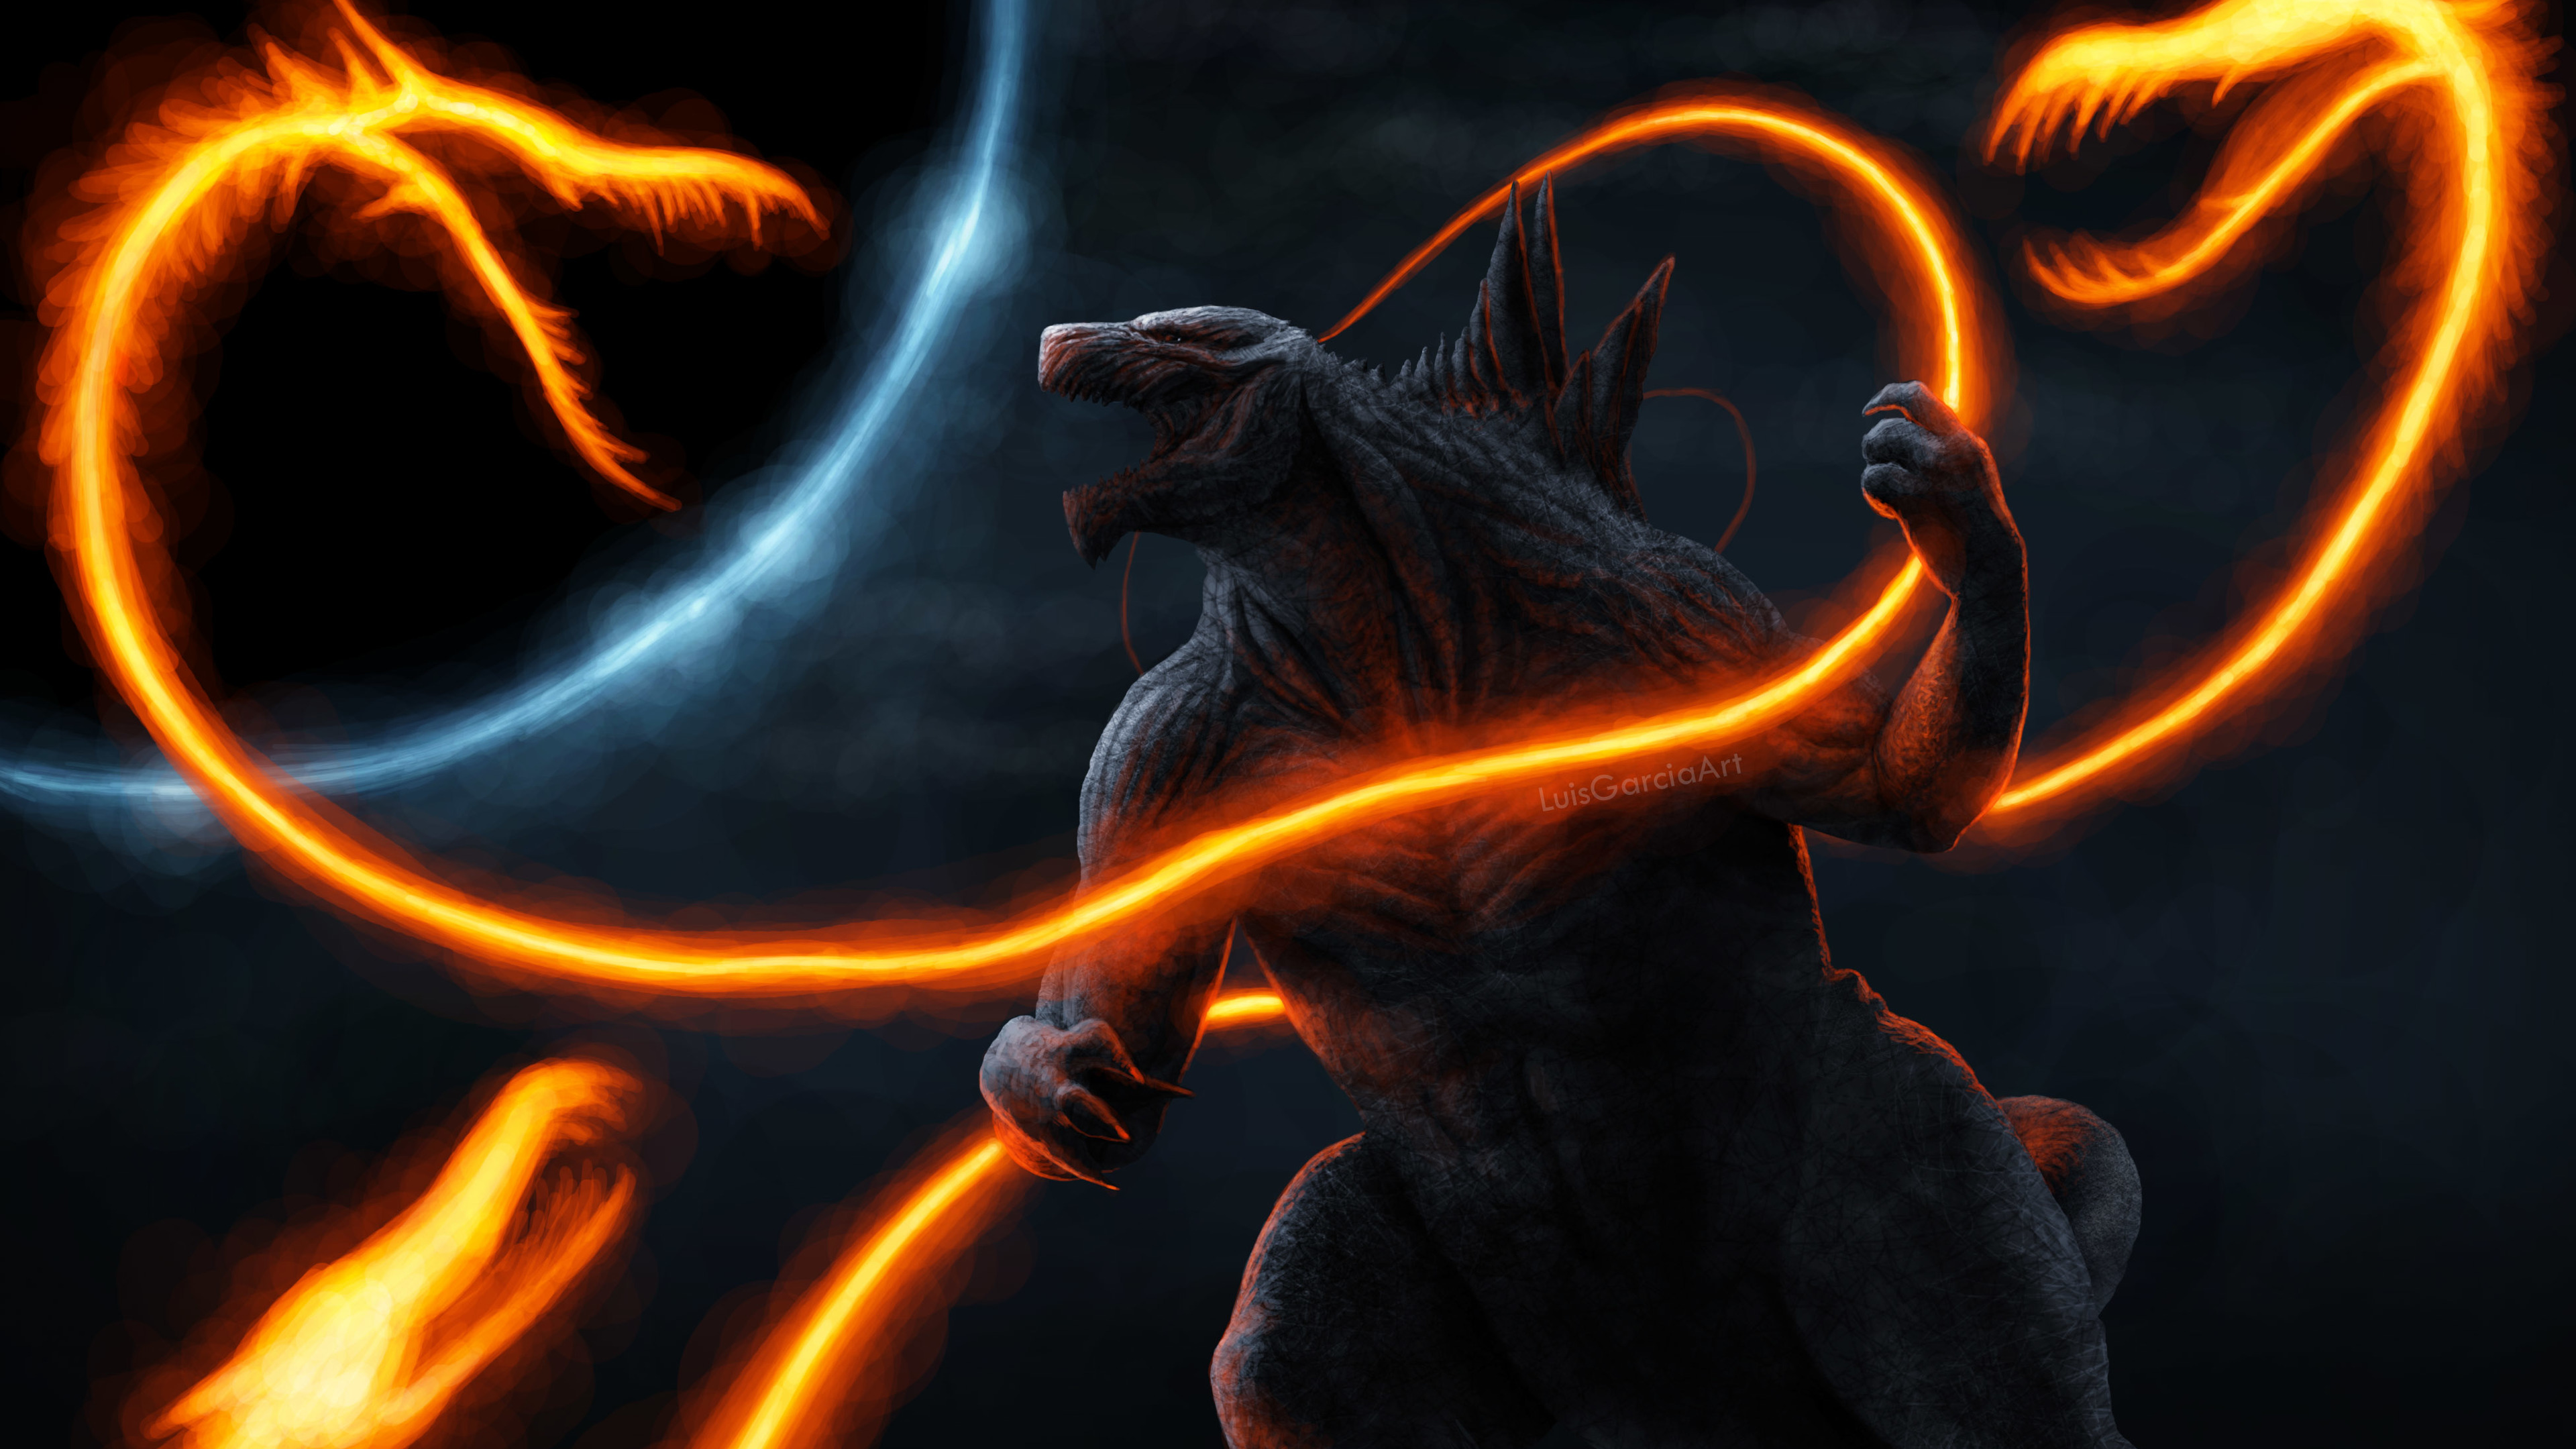 Ghidorah Noodles Vs Anime Godzilla 4k hd-wallpapers ...